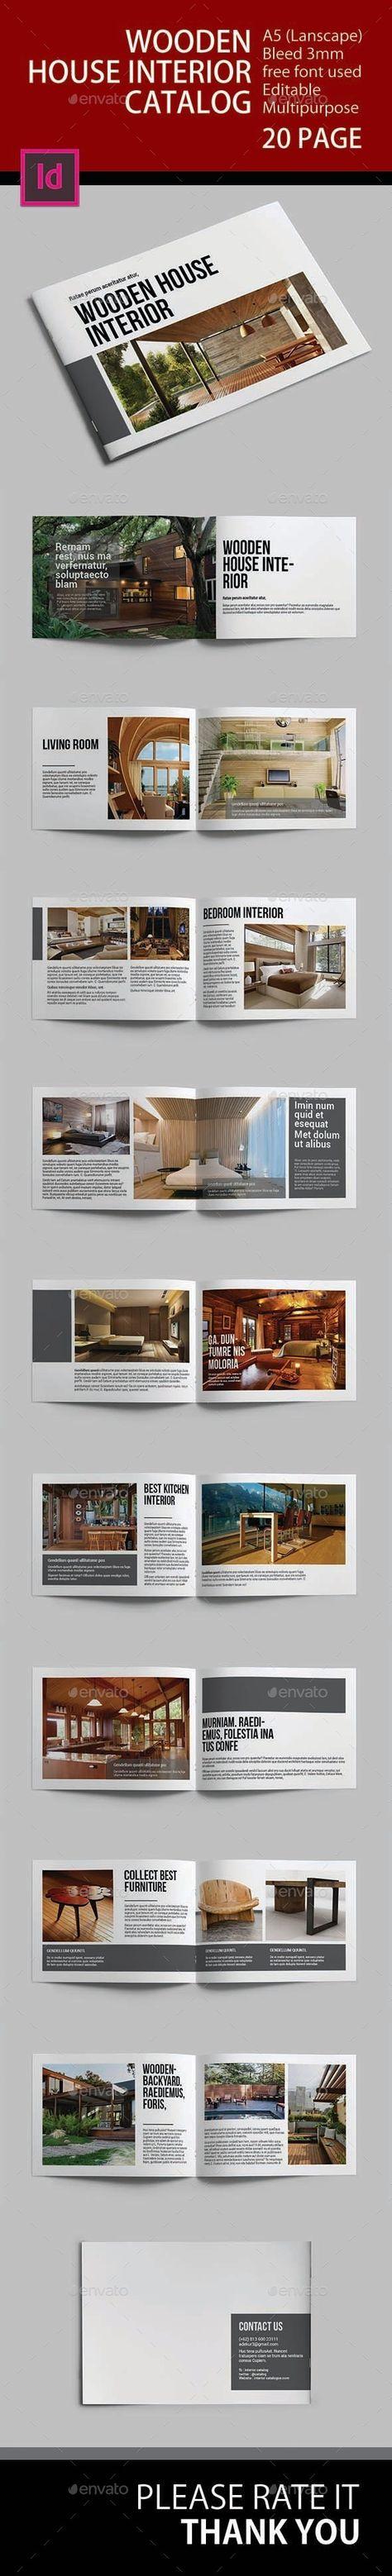 house interior catalog brochures and catalog